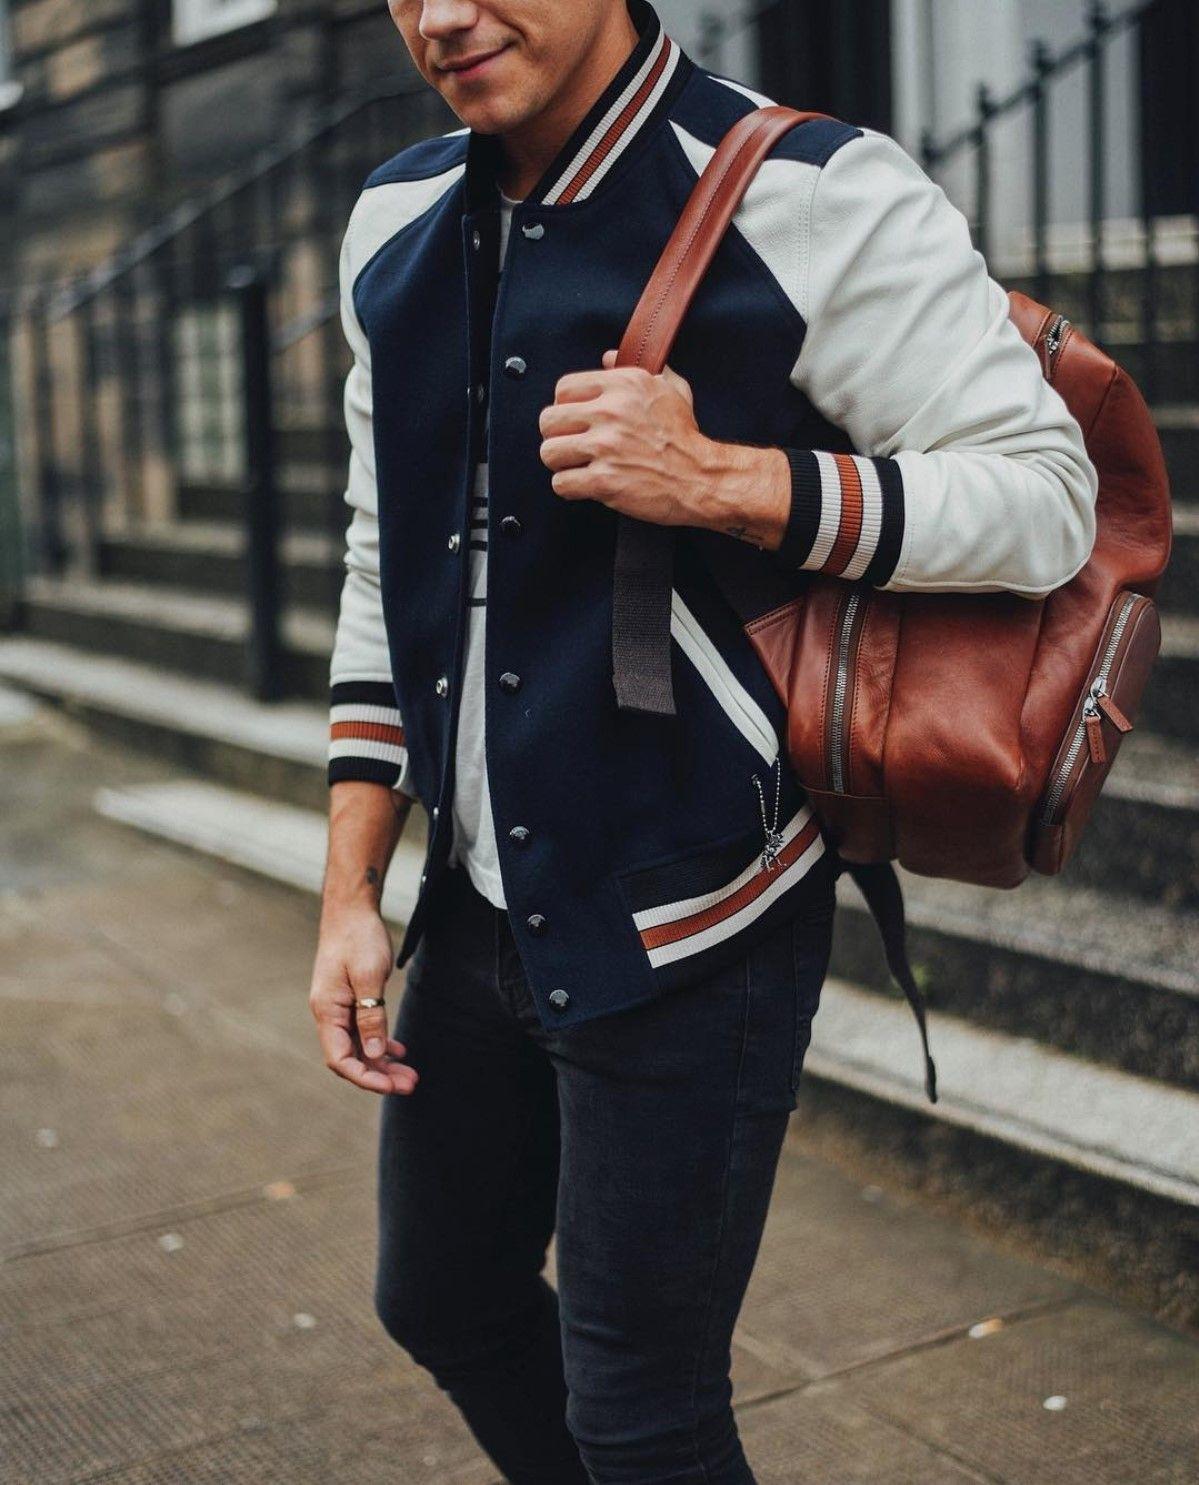 0deb406517 Jaquetas de inverno  Se proteja do frio com estilo